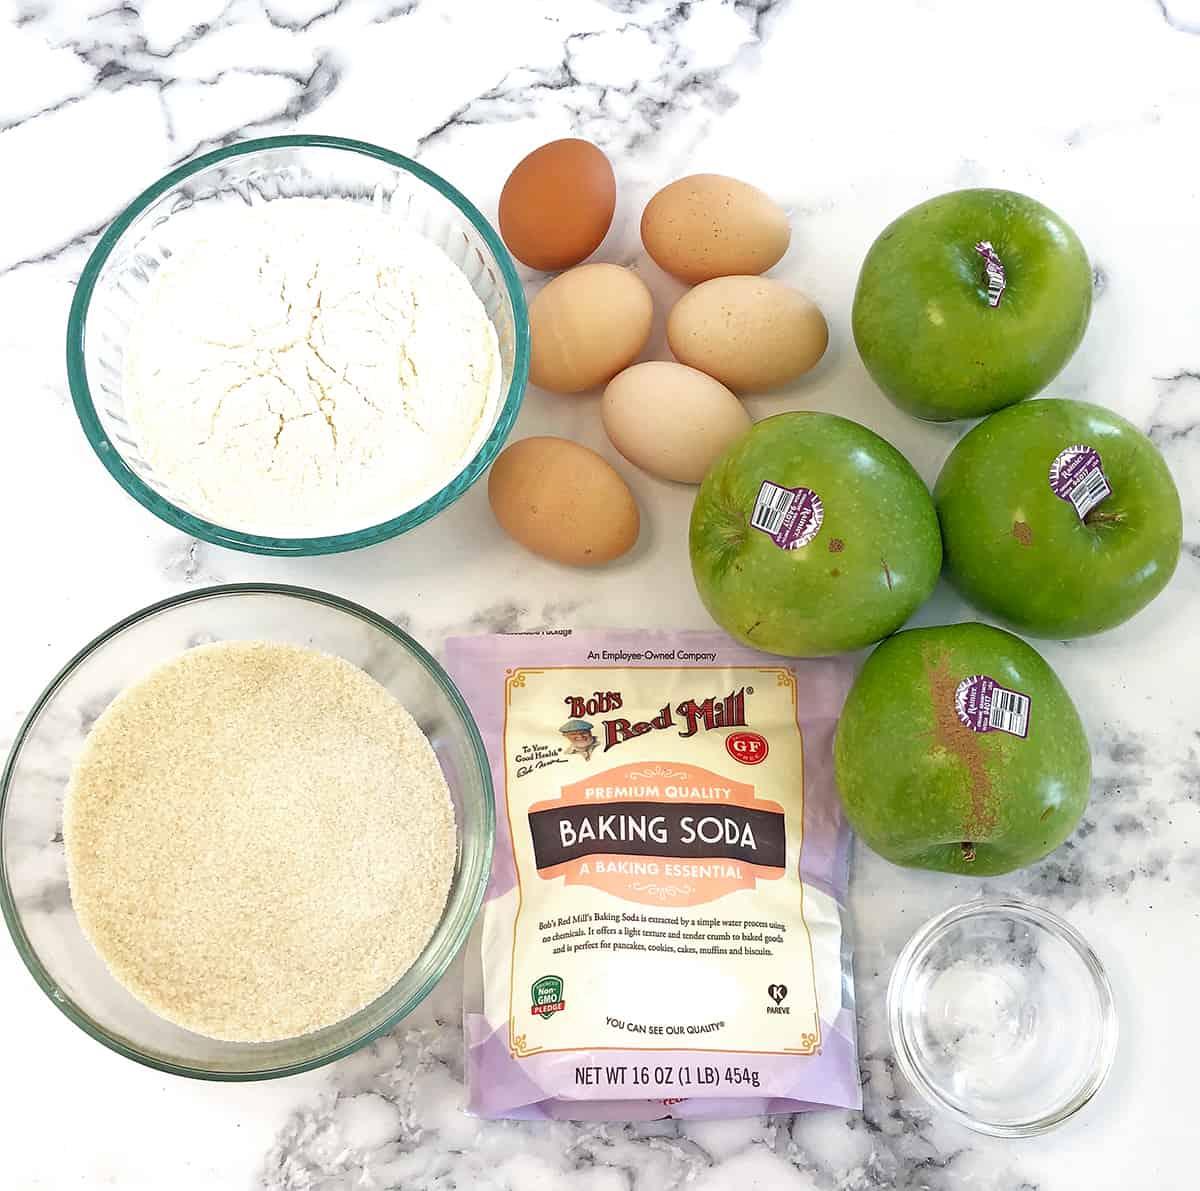 Apple Cake Batter Ingredients